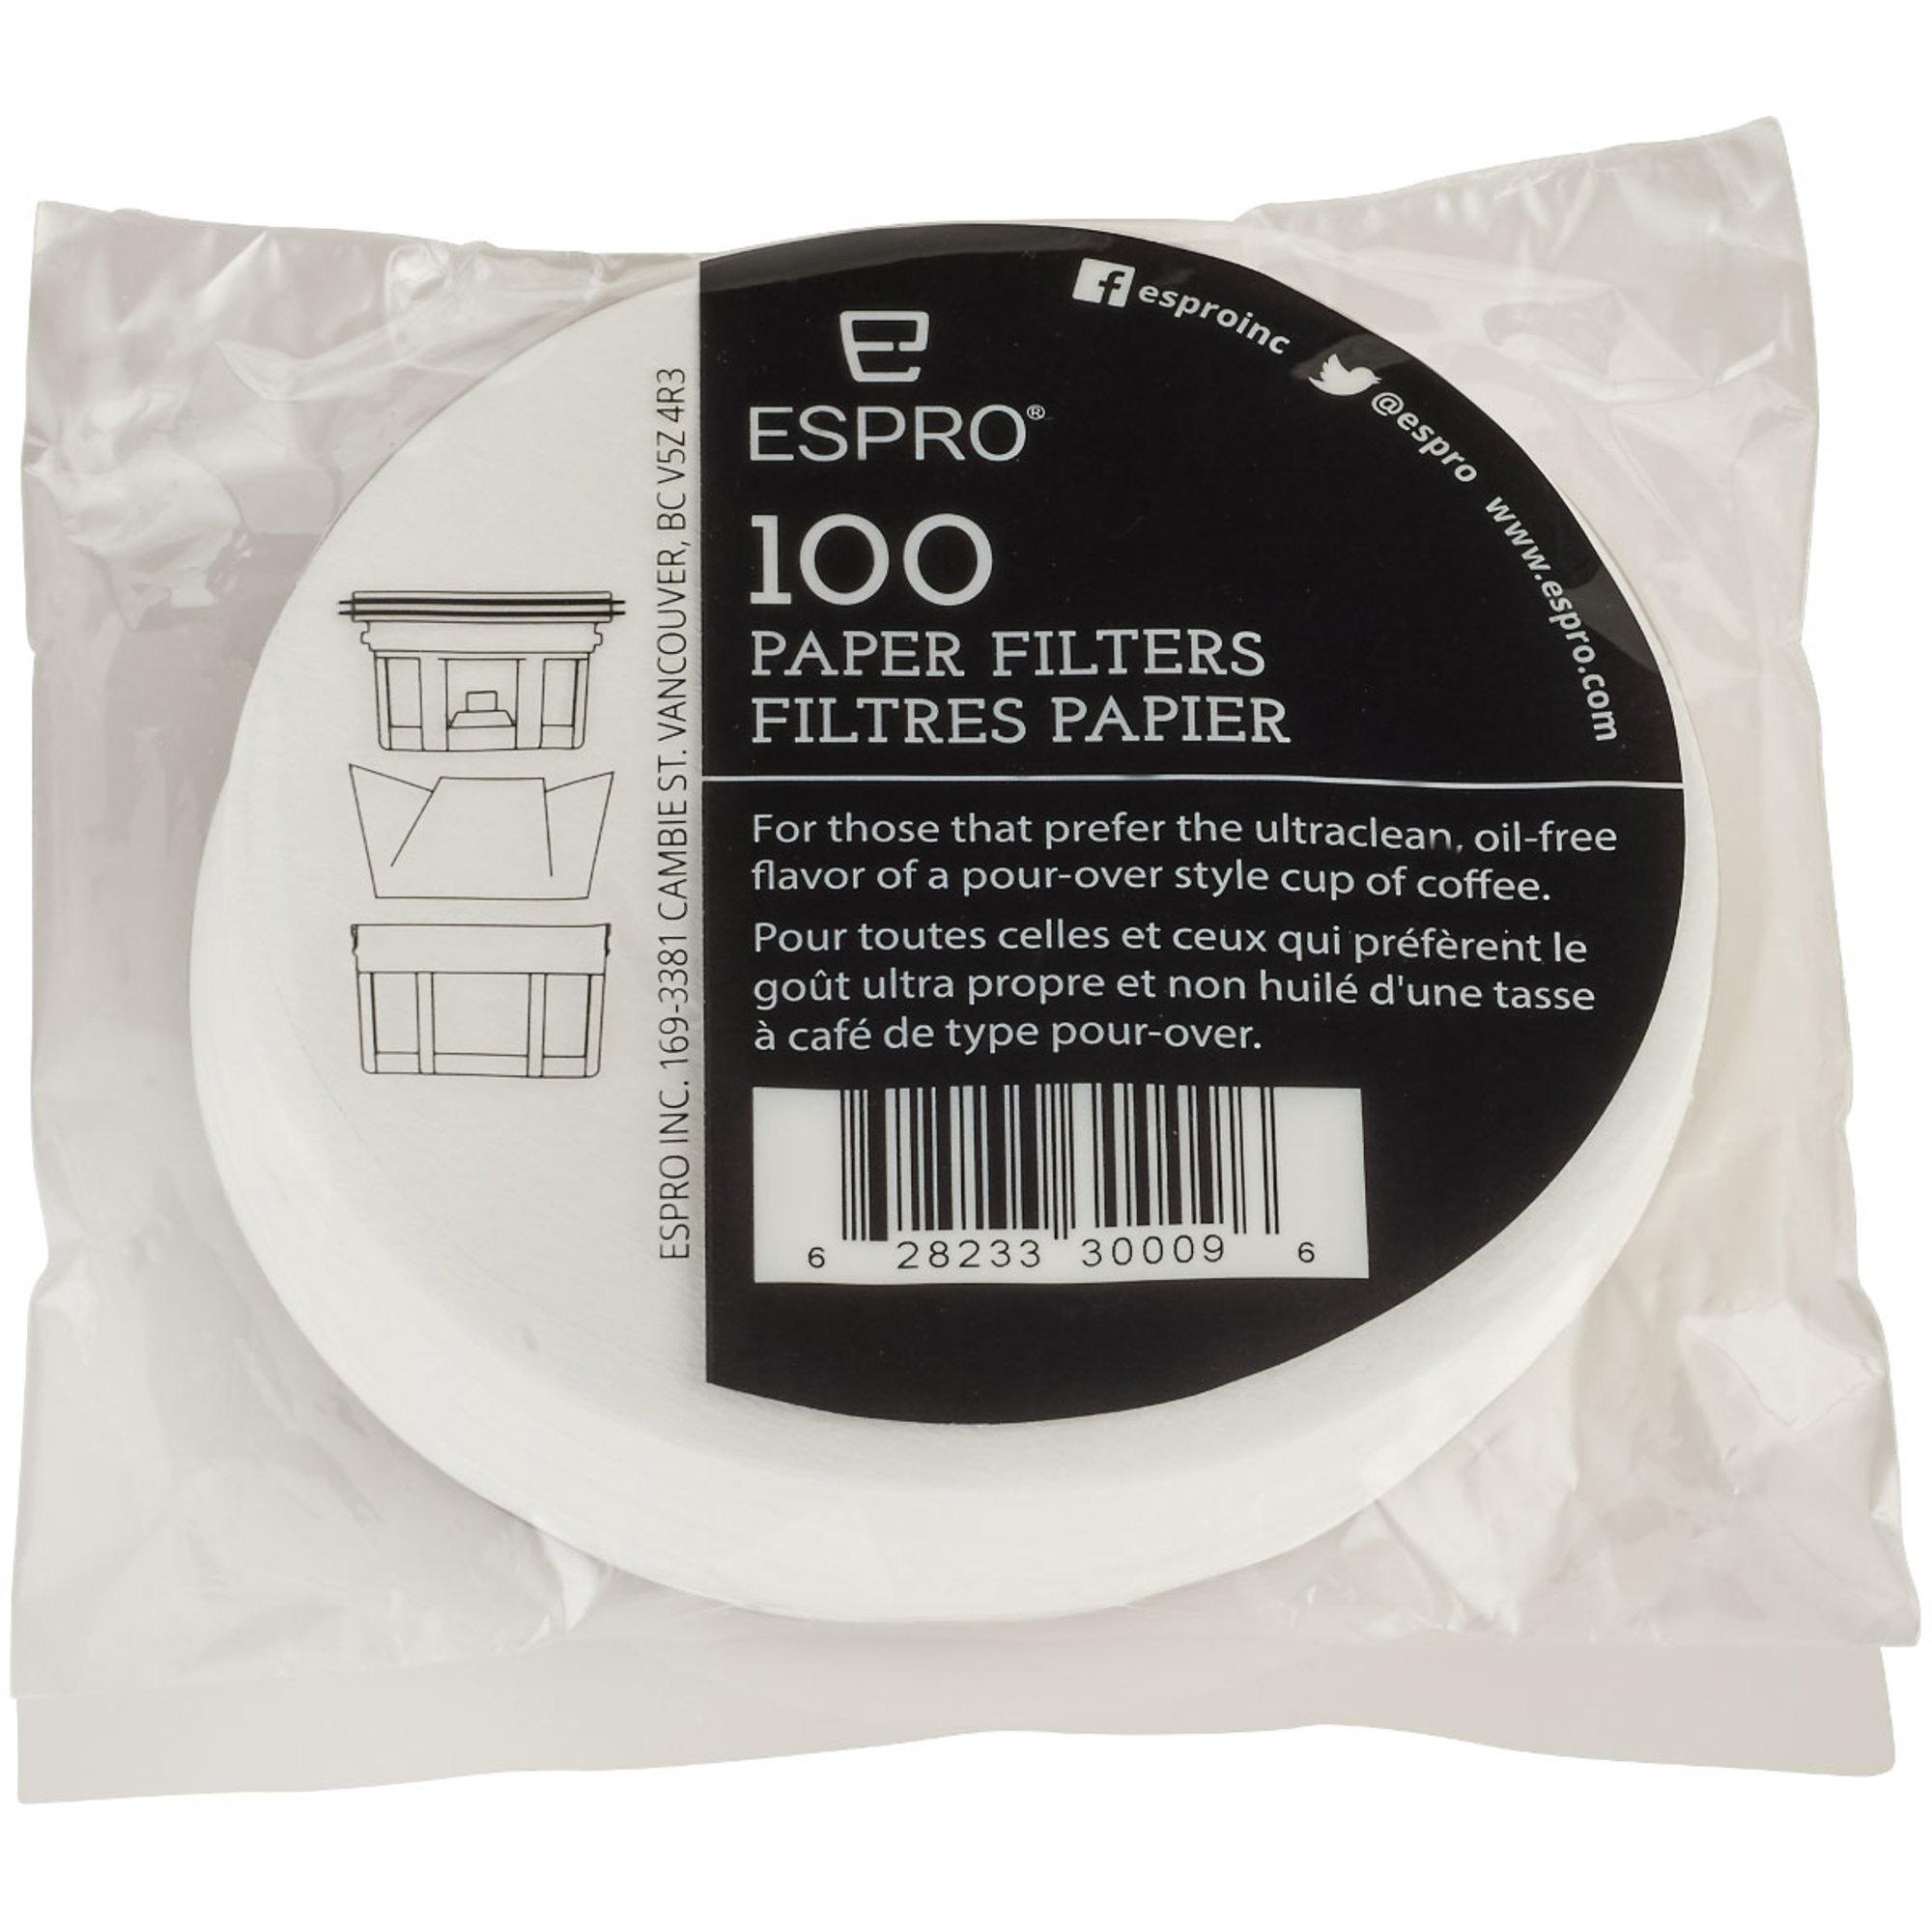 Espro 100 stk. pappersfilter till 025 liter